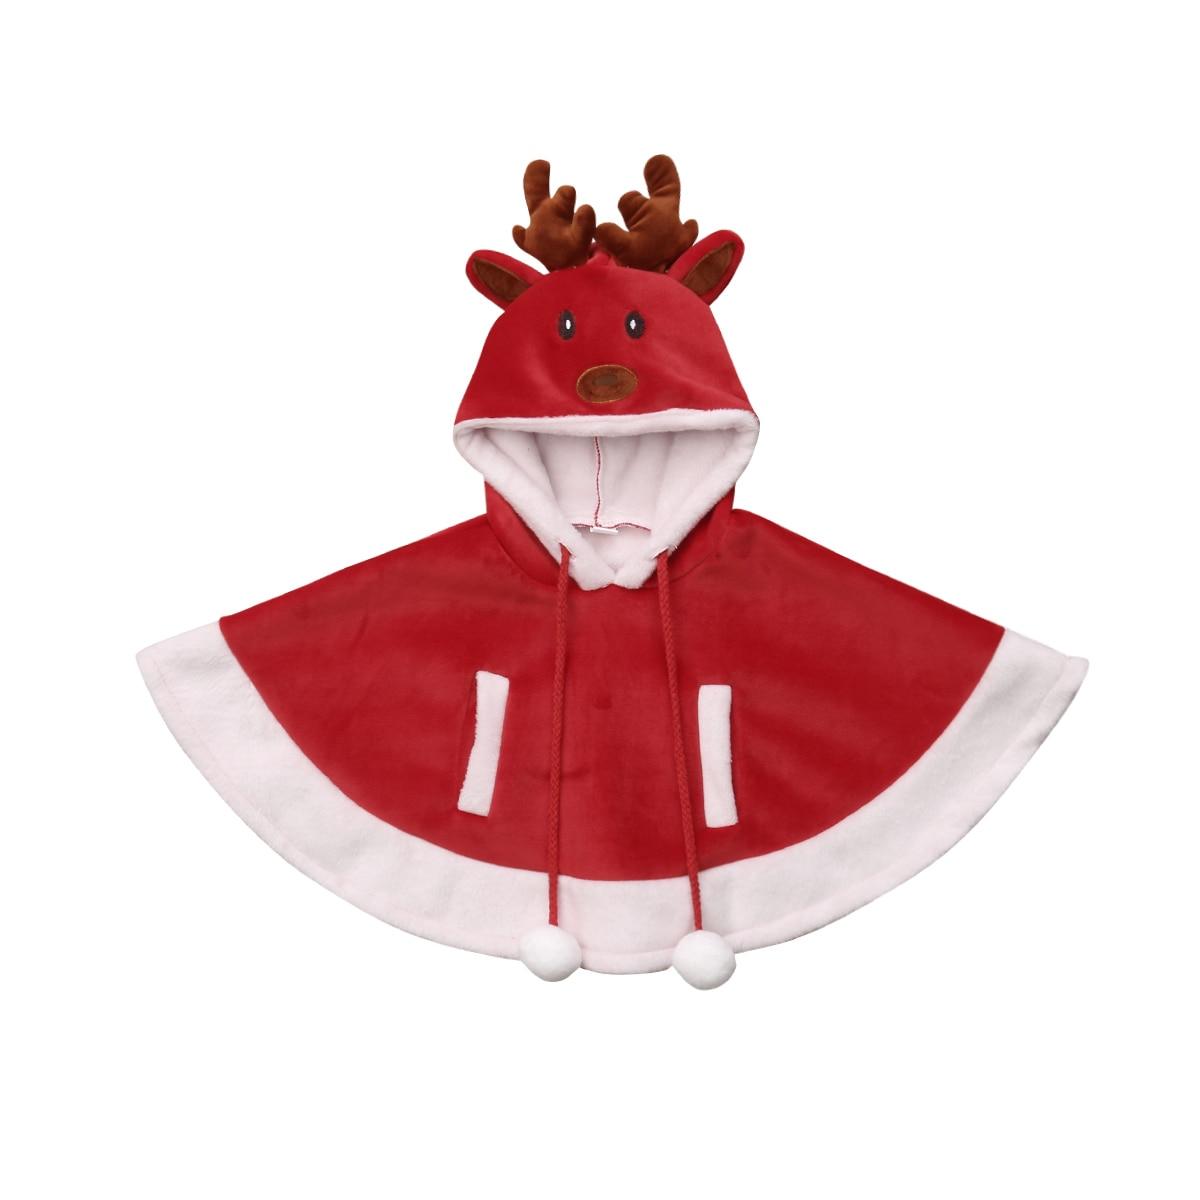 Telotuny Autumn Winter Boy Girl Baby Hooded Christmas Deer Outwear Cloak Jacket Coat A Sweet Christmas Gift For Baby Z0829 Jackets & Coats